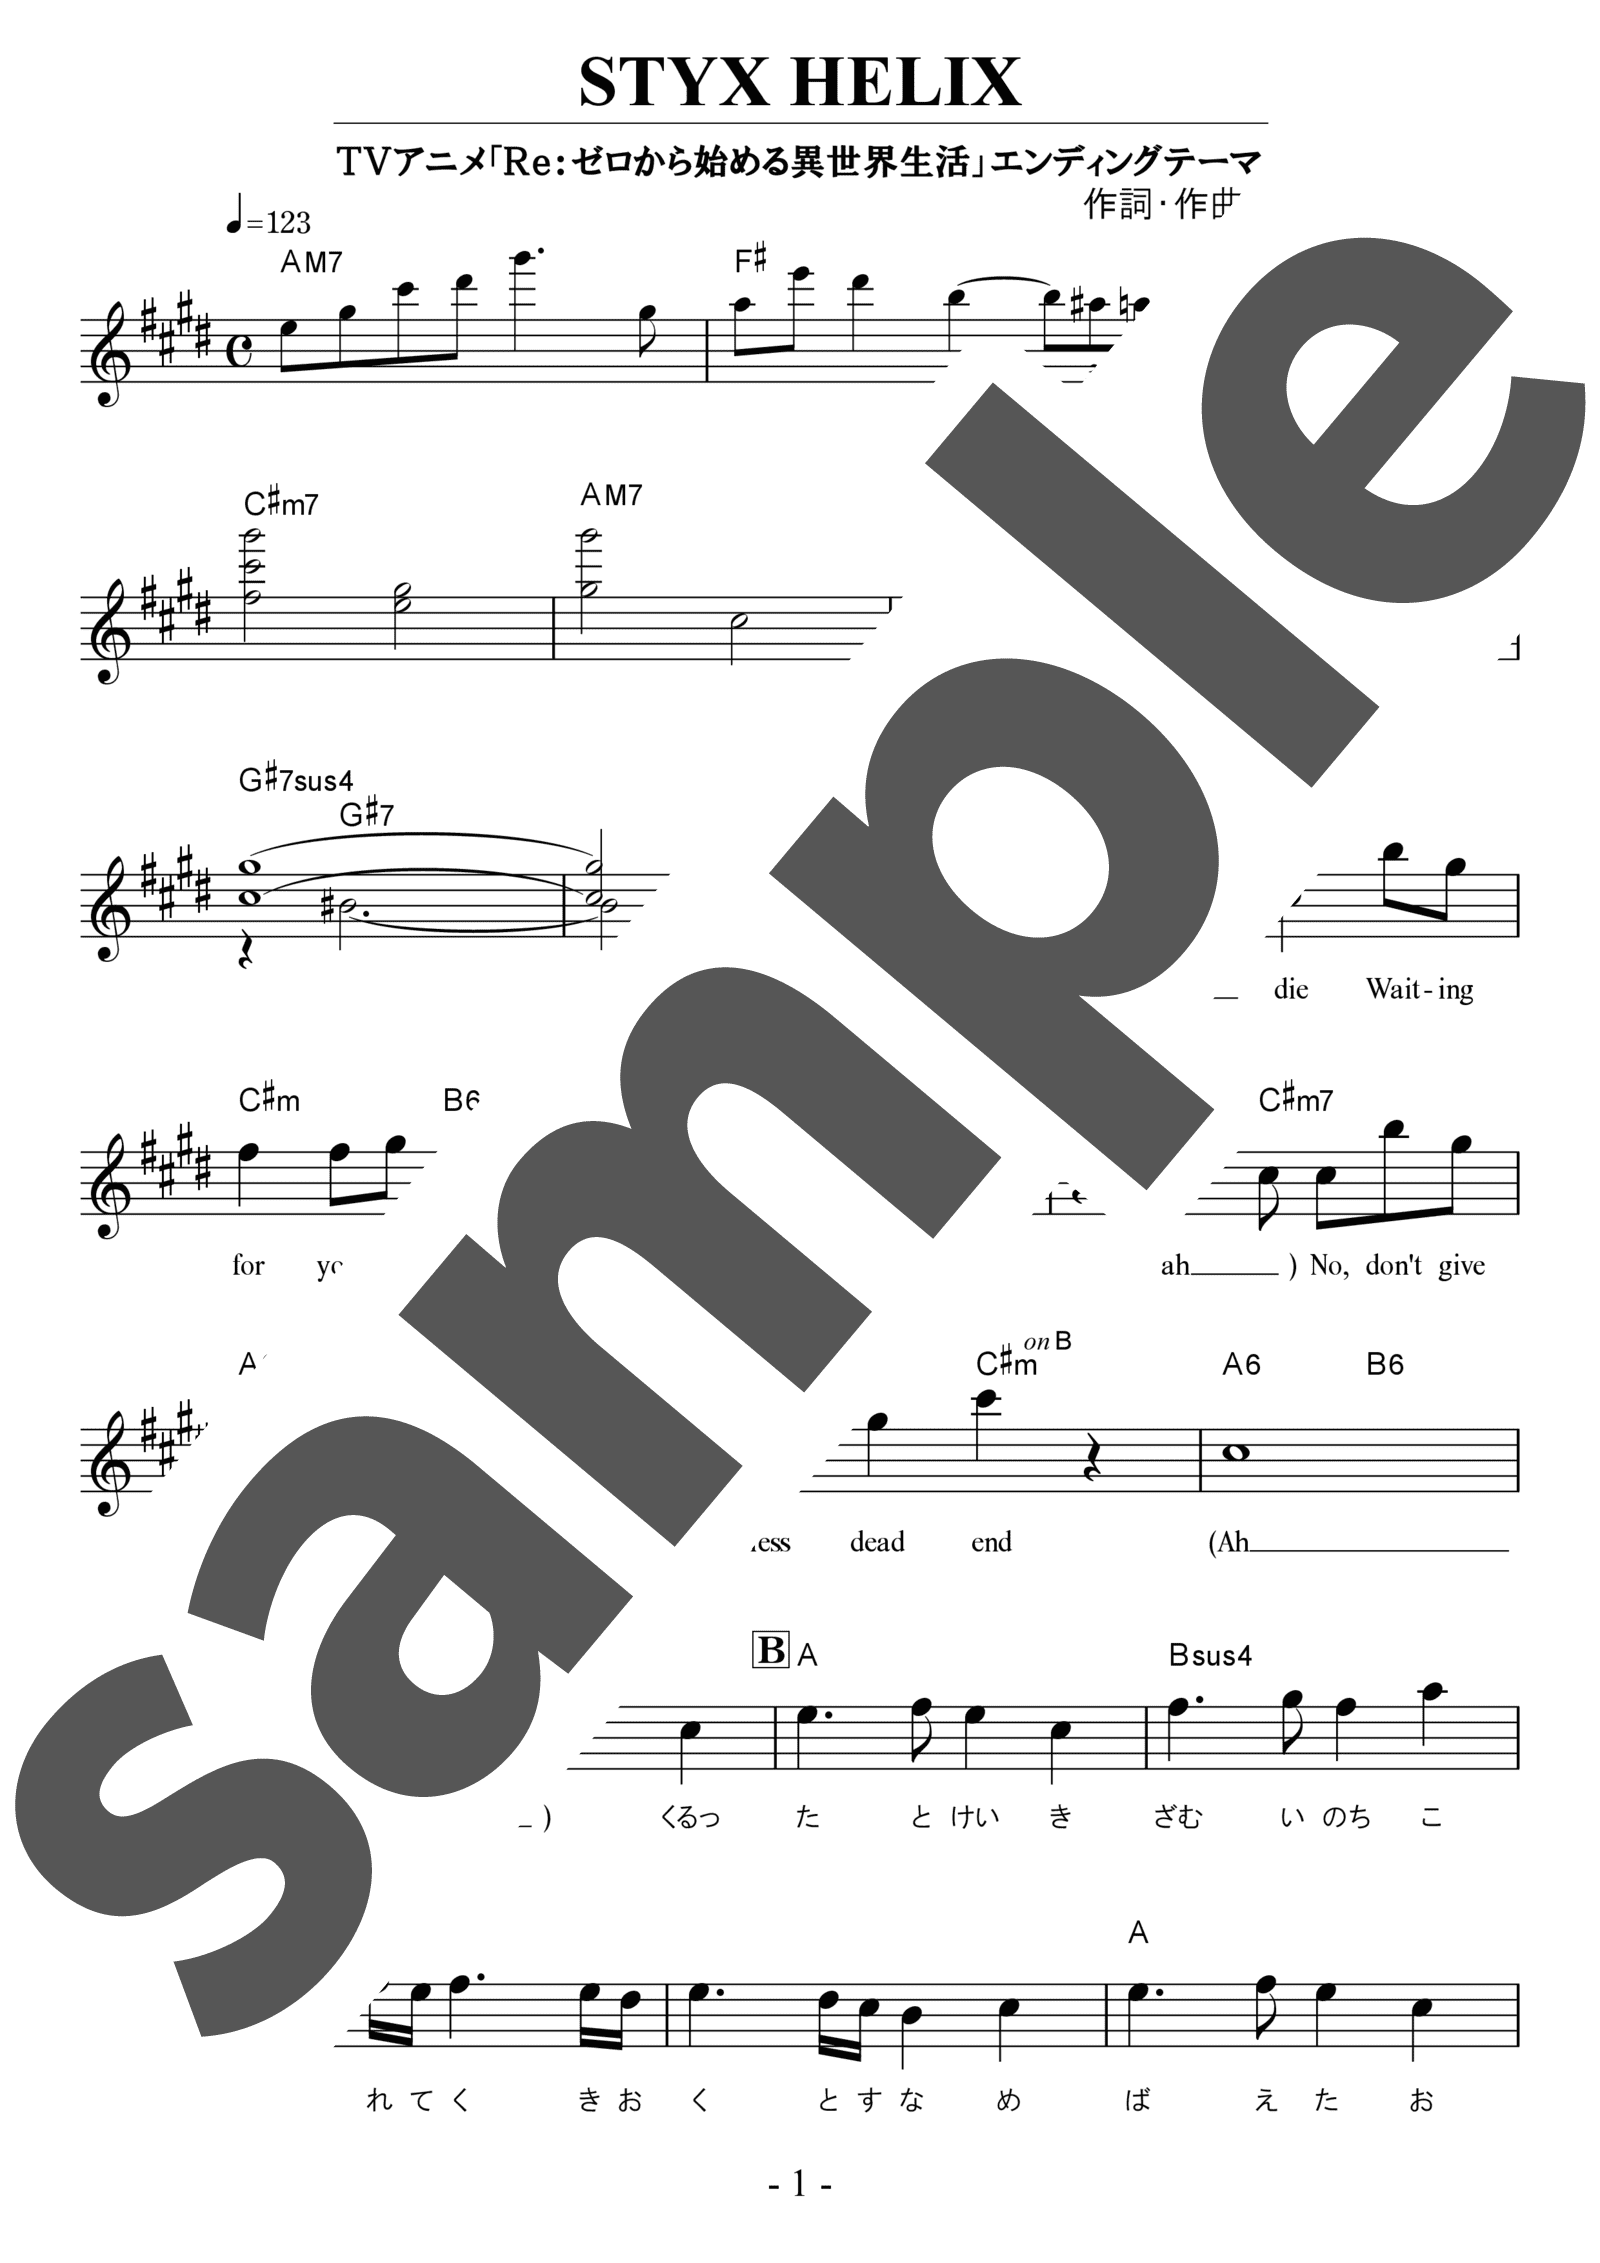 「STYX HELIX」のサンプル楽譜